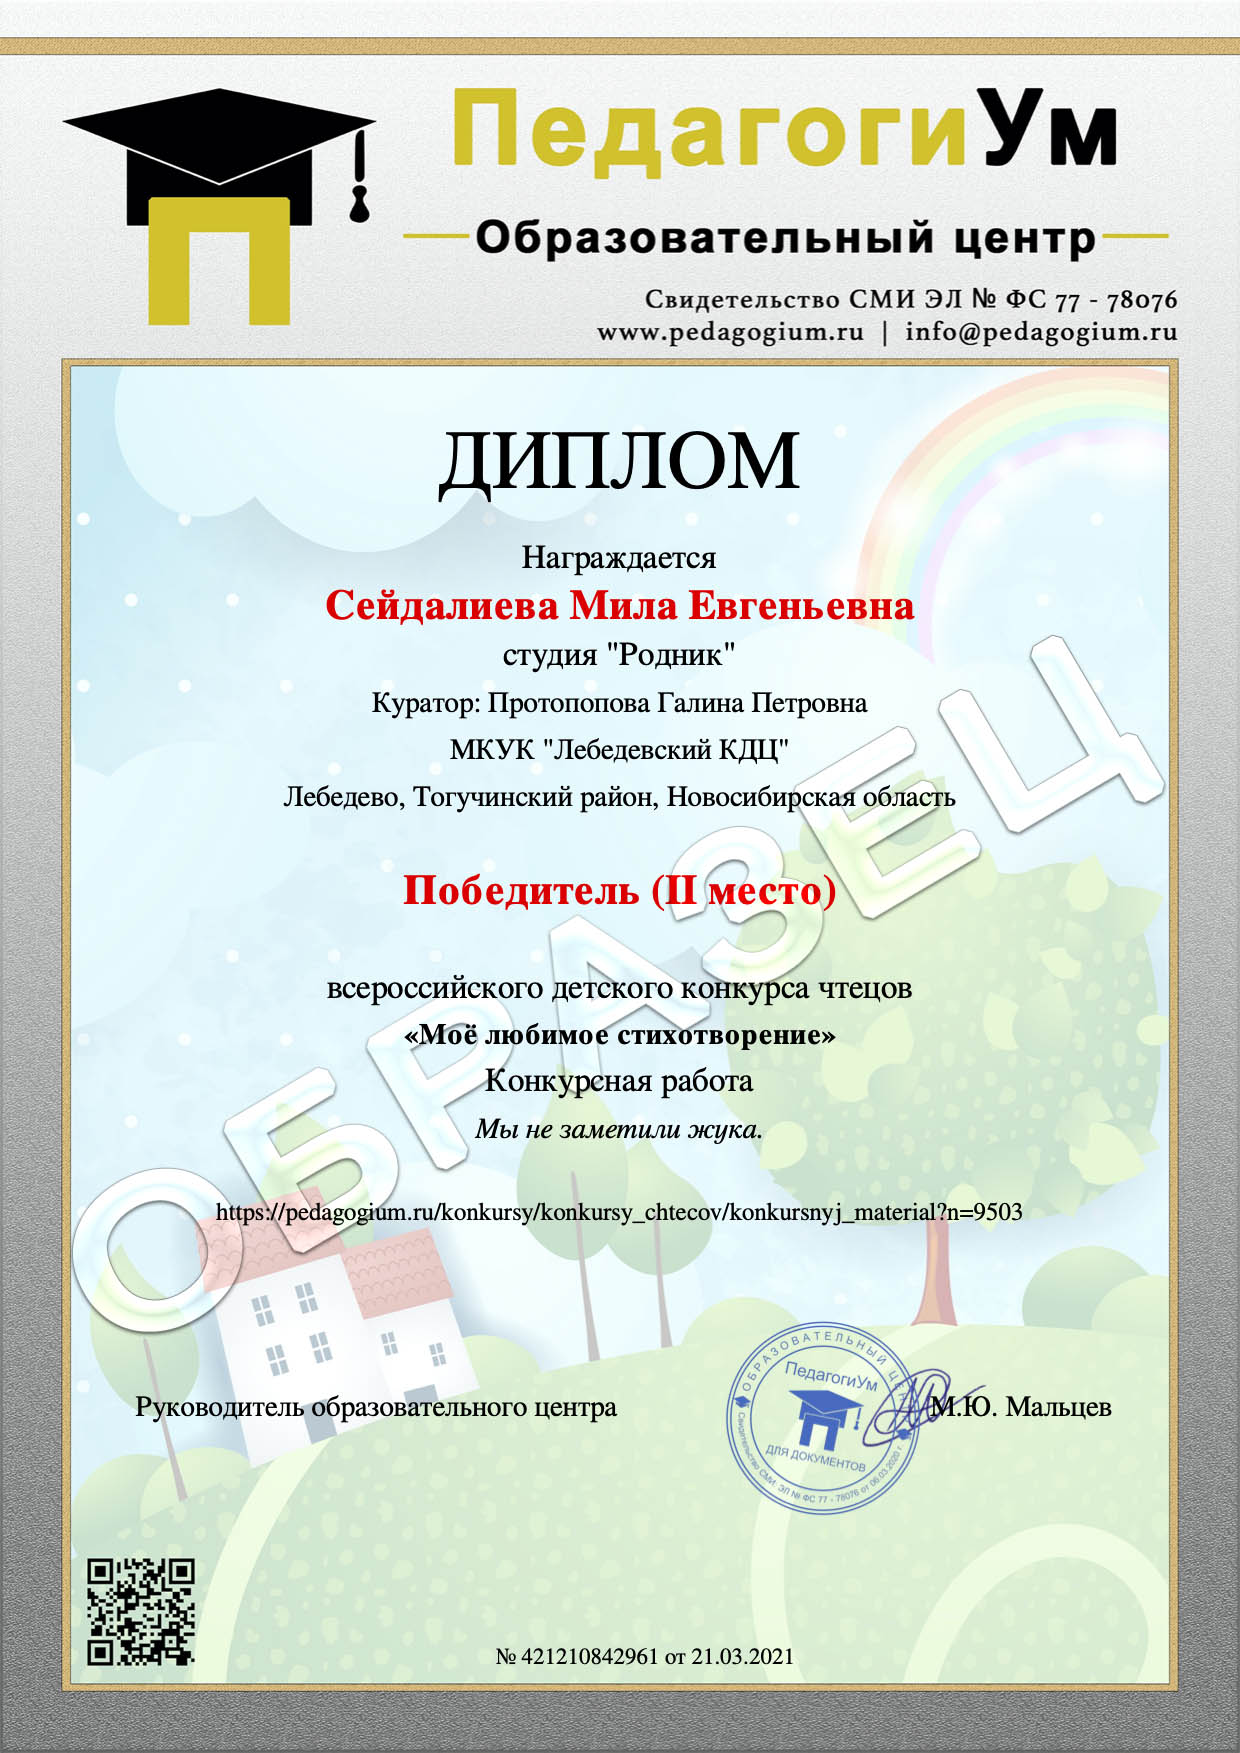 Образец документа воспитаннику-участнику детского конкурса чтецов центра ПедагогиУм.